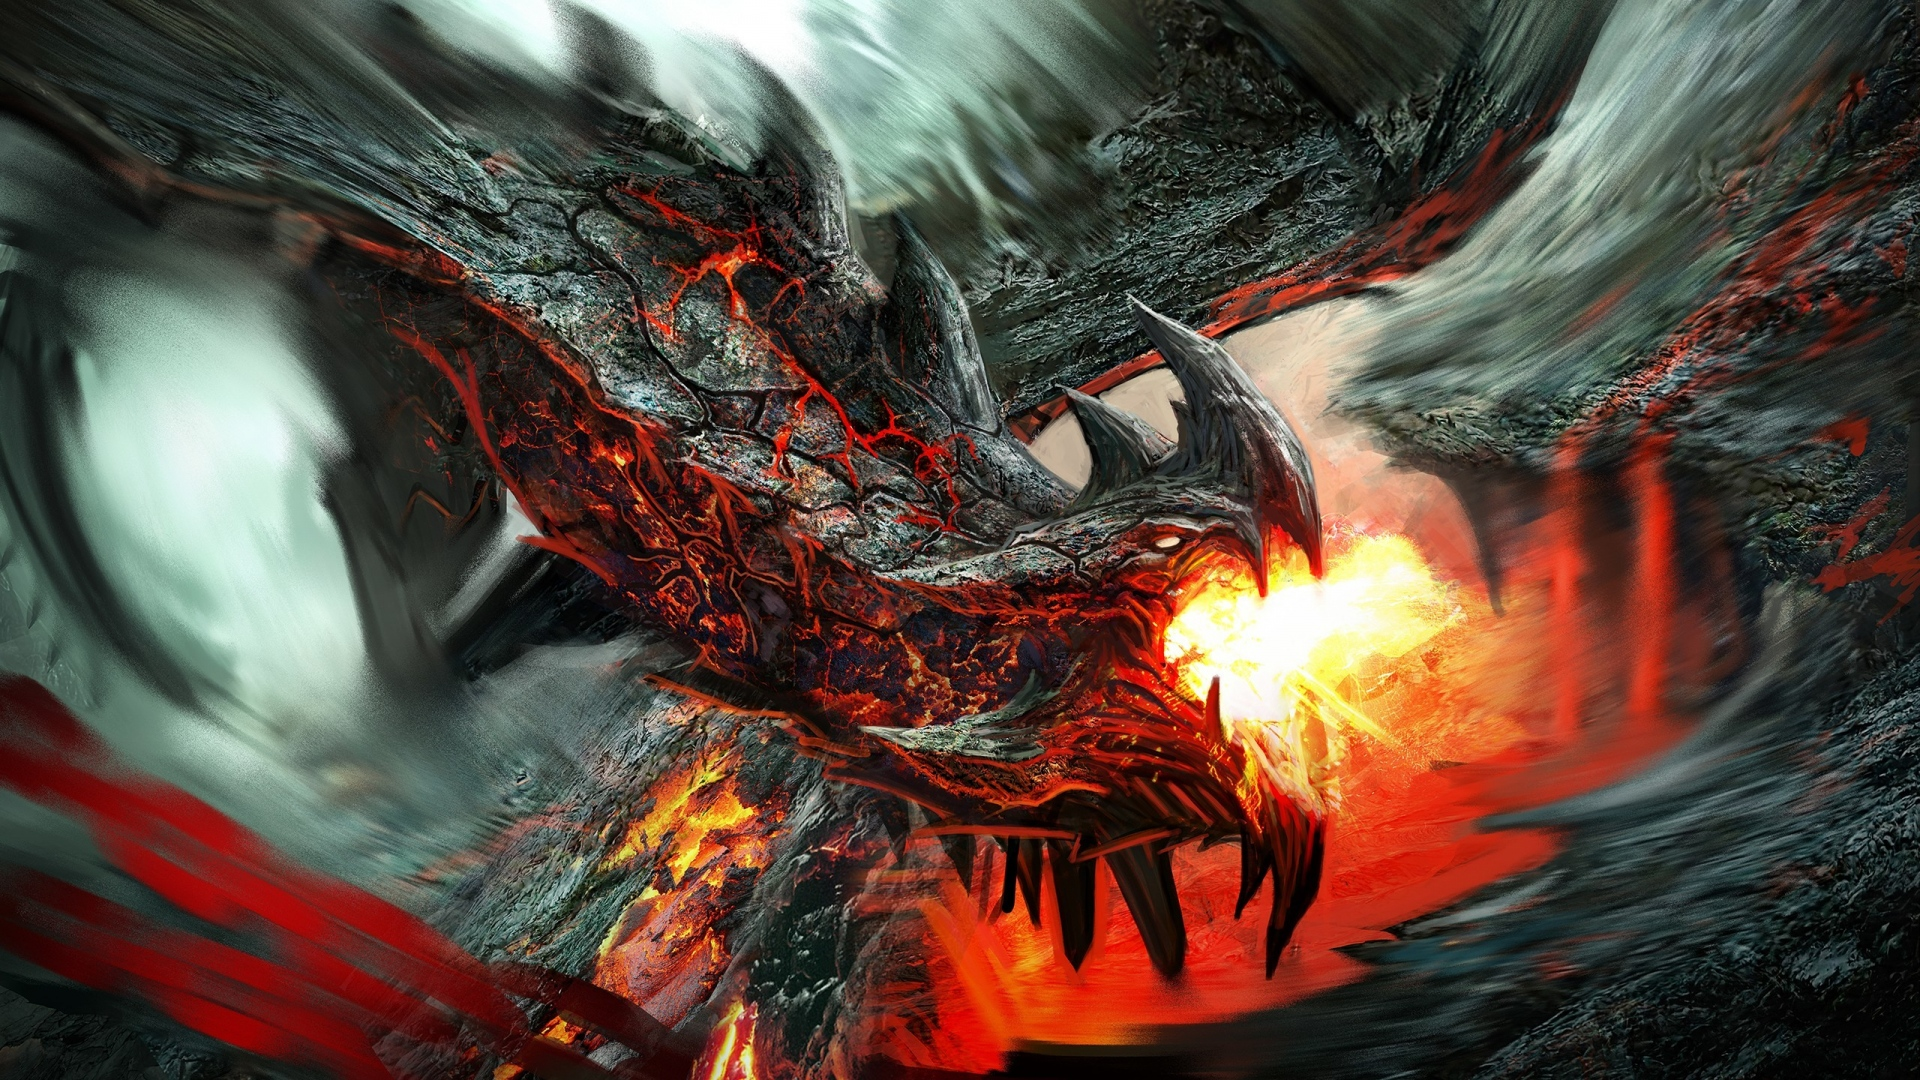 Halloween Fall Iphone Wallpaper Cool Dragon Hd Wallpaper Backgrounds Free Download